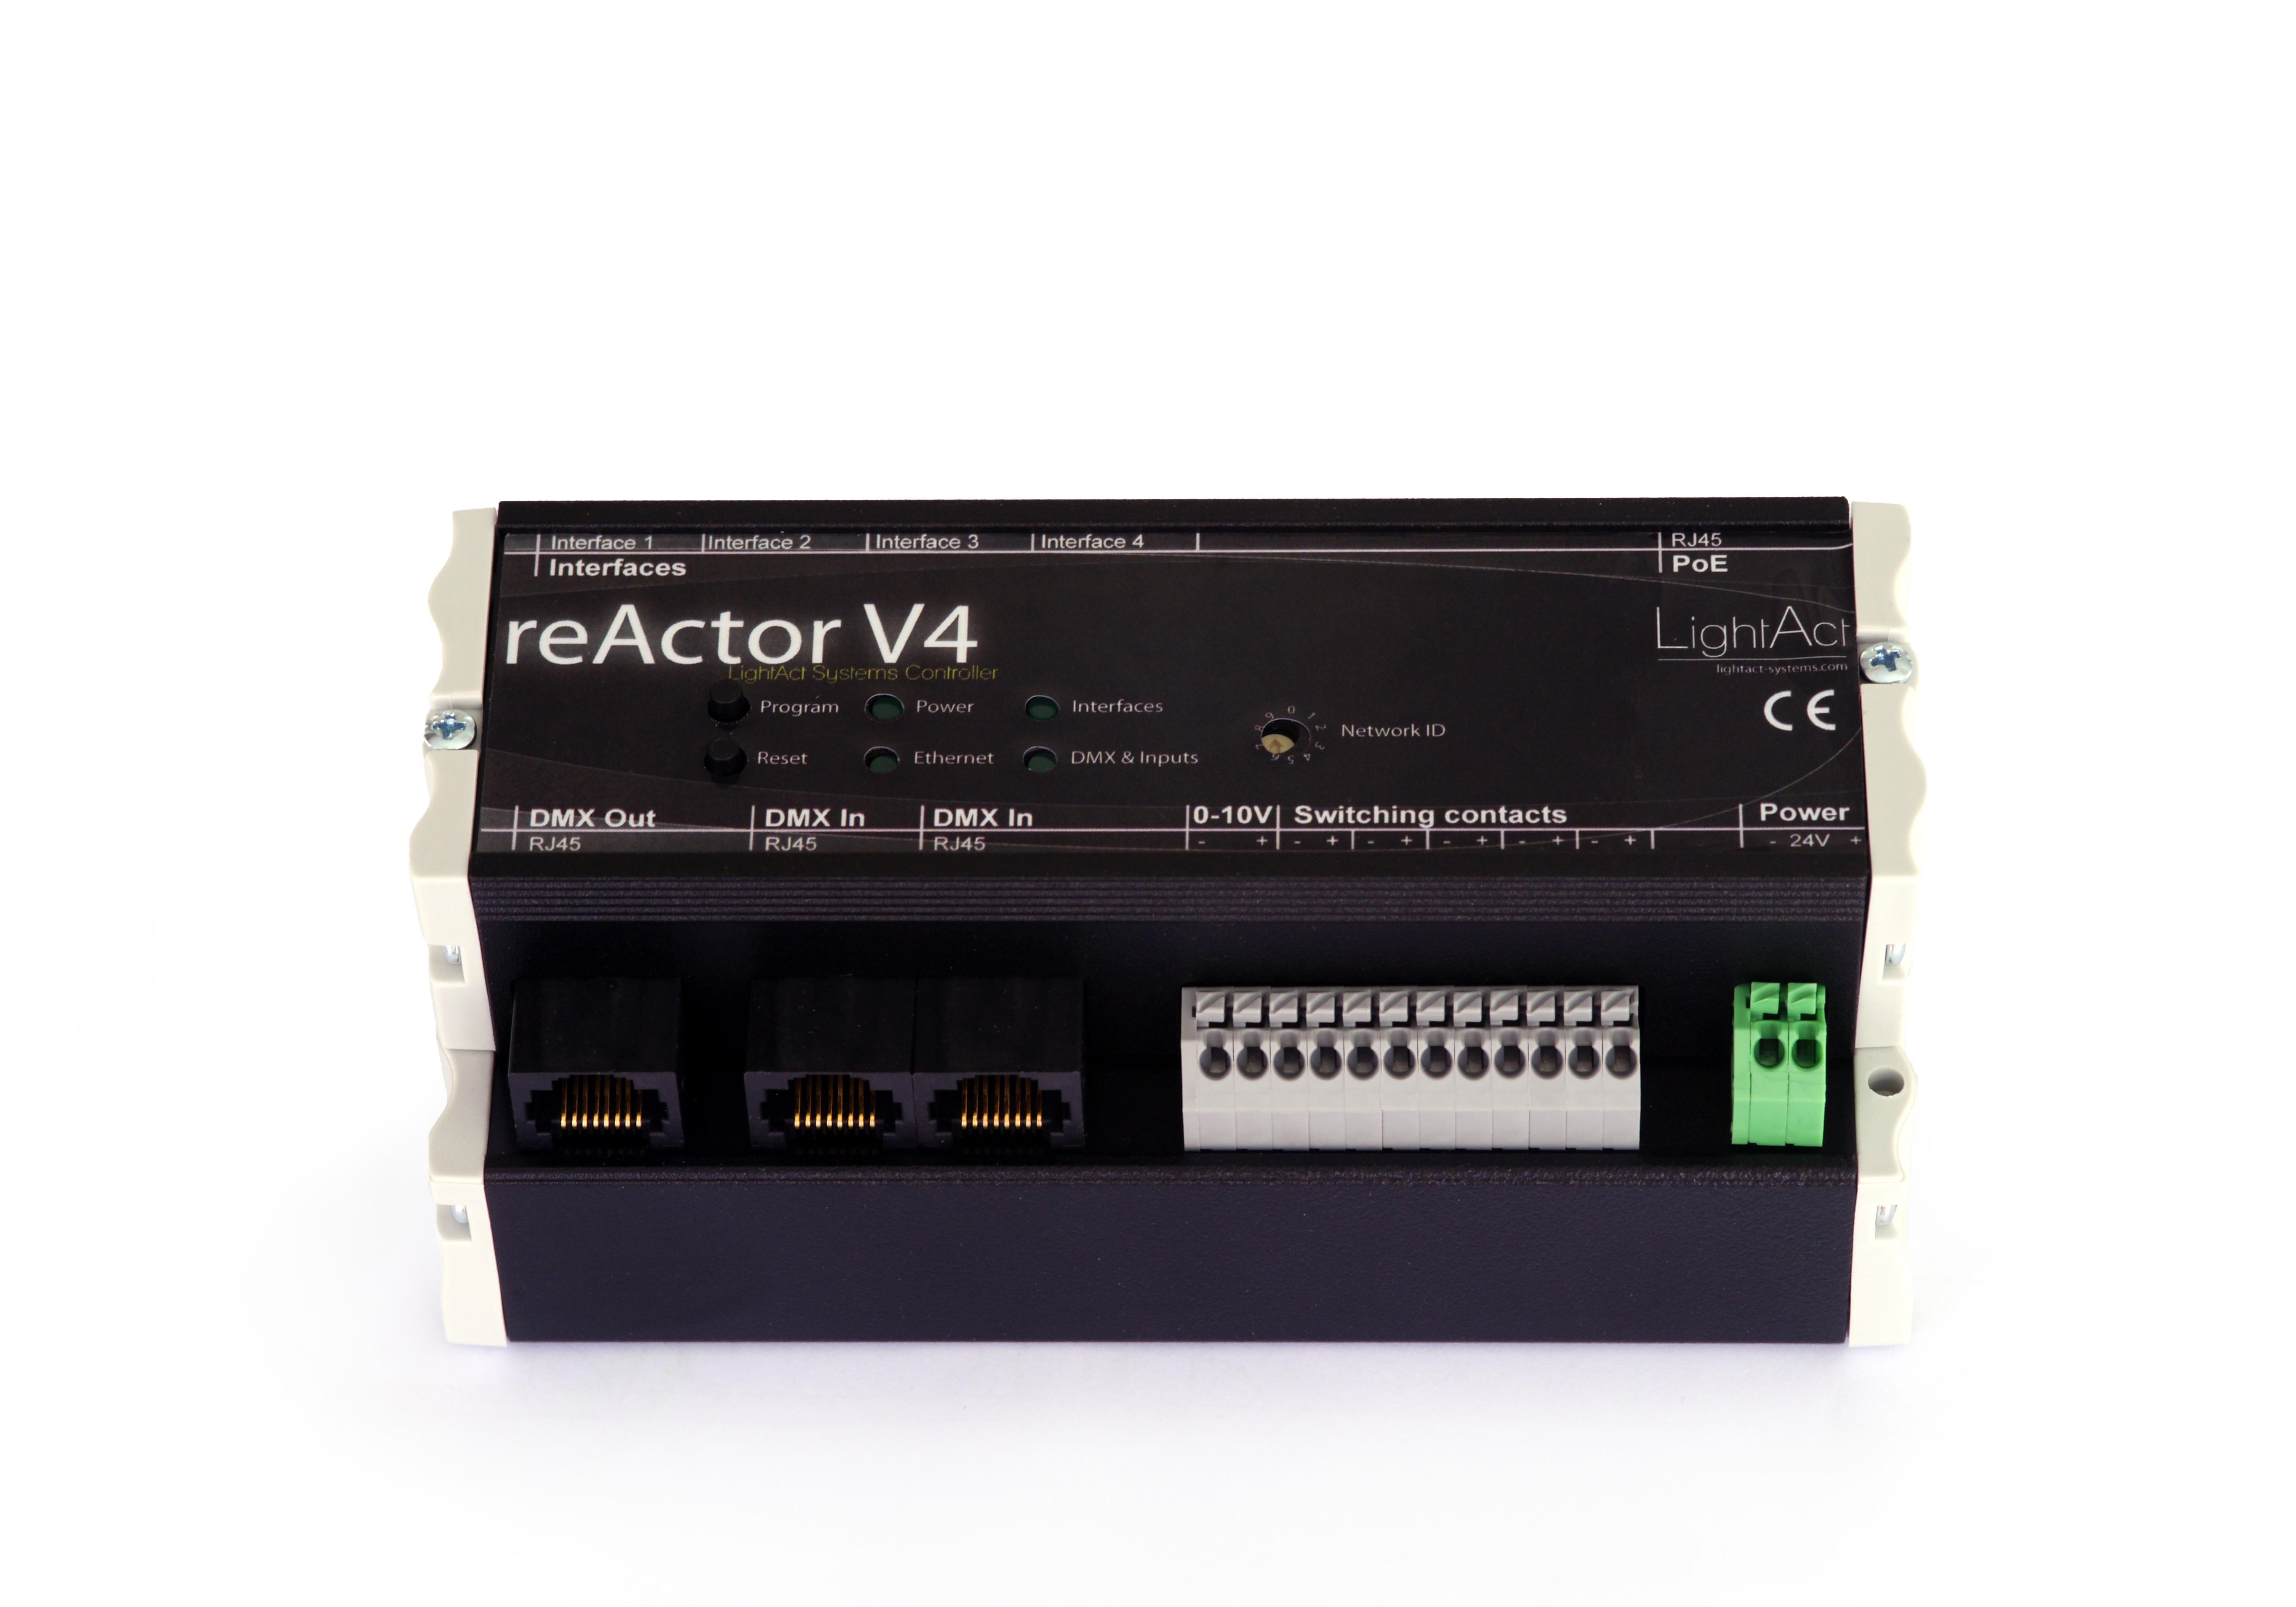 Reactor V4 met 4 interface connectors